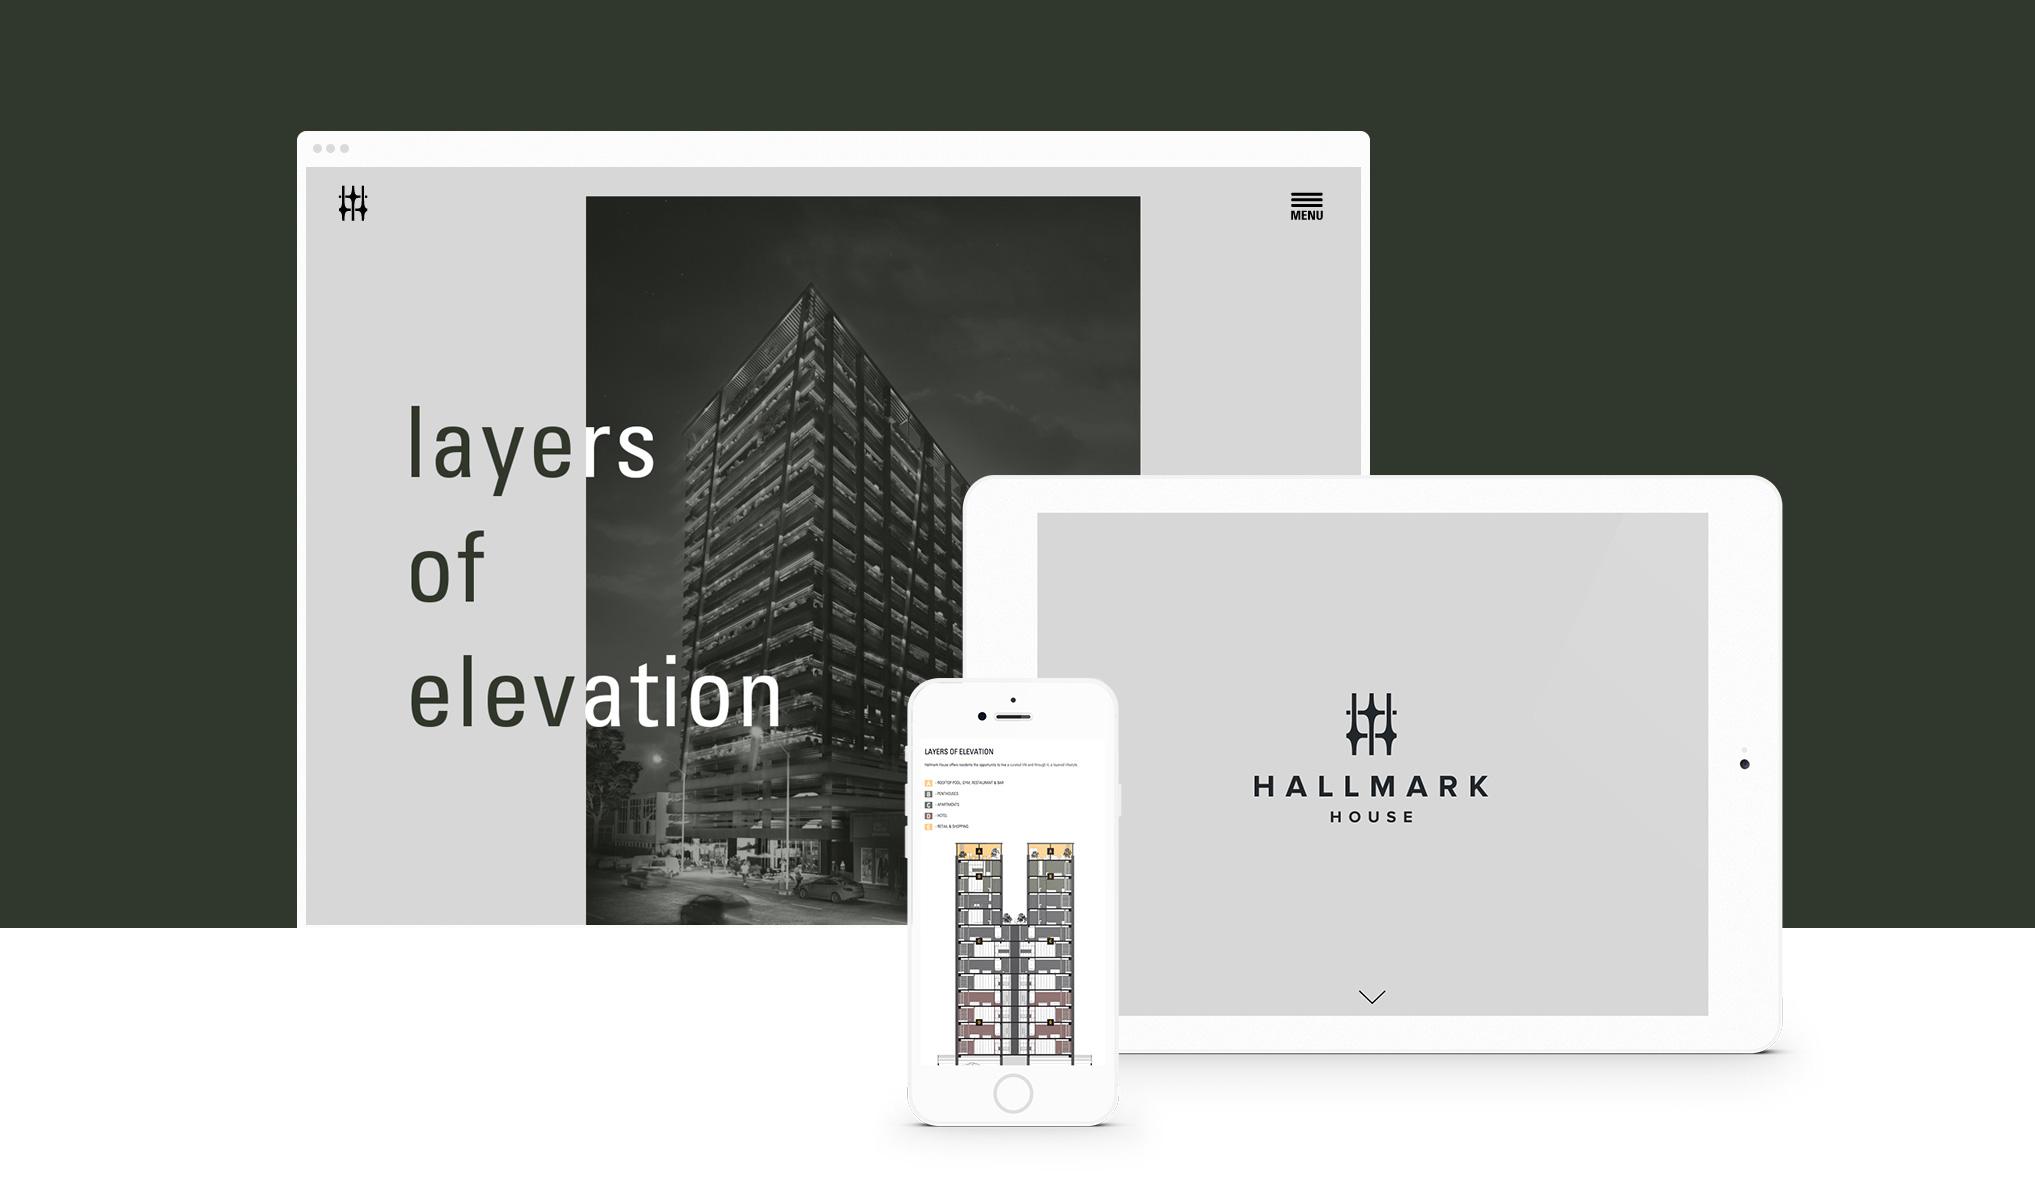 Hallmark House Device Showcase